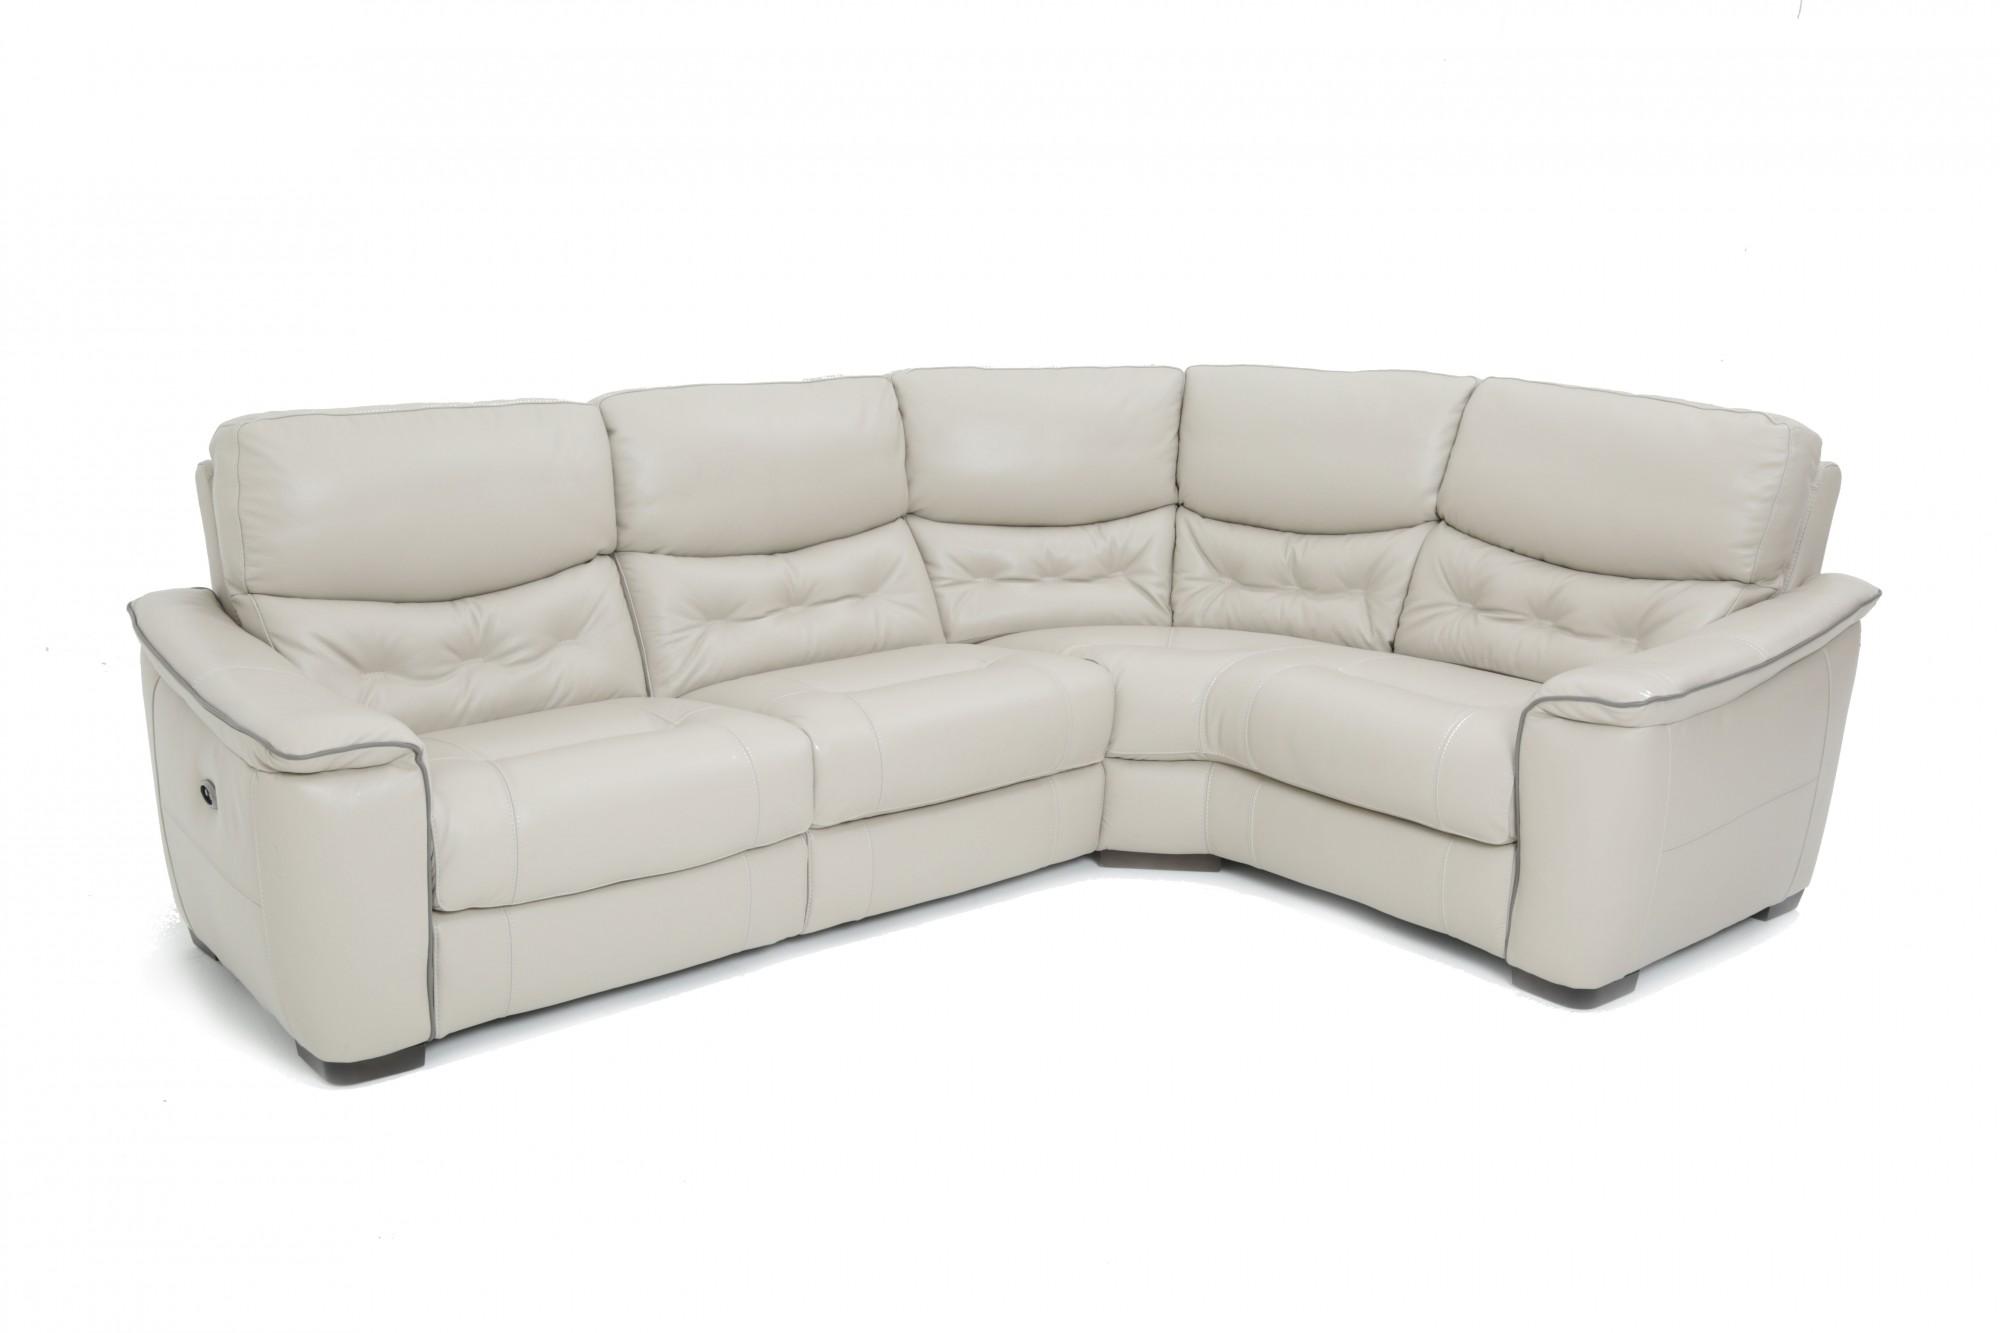 Zen Leather Large Corner Power Recliner Sofa Group